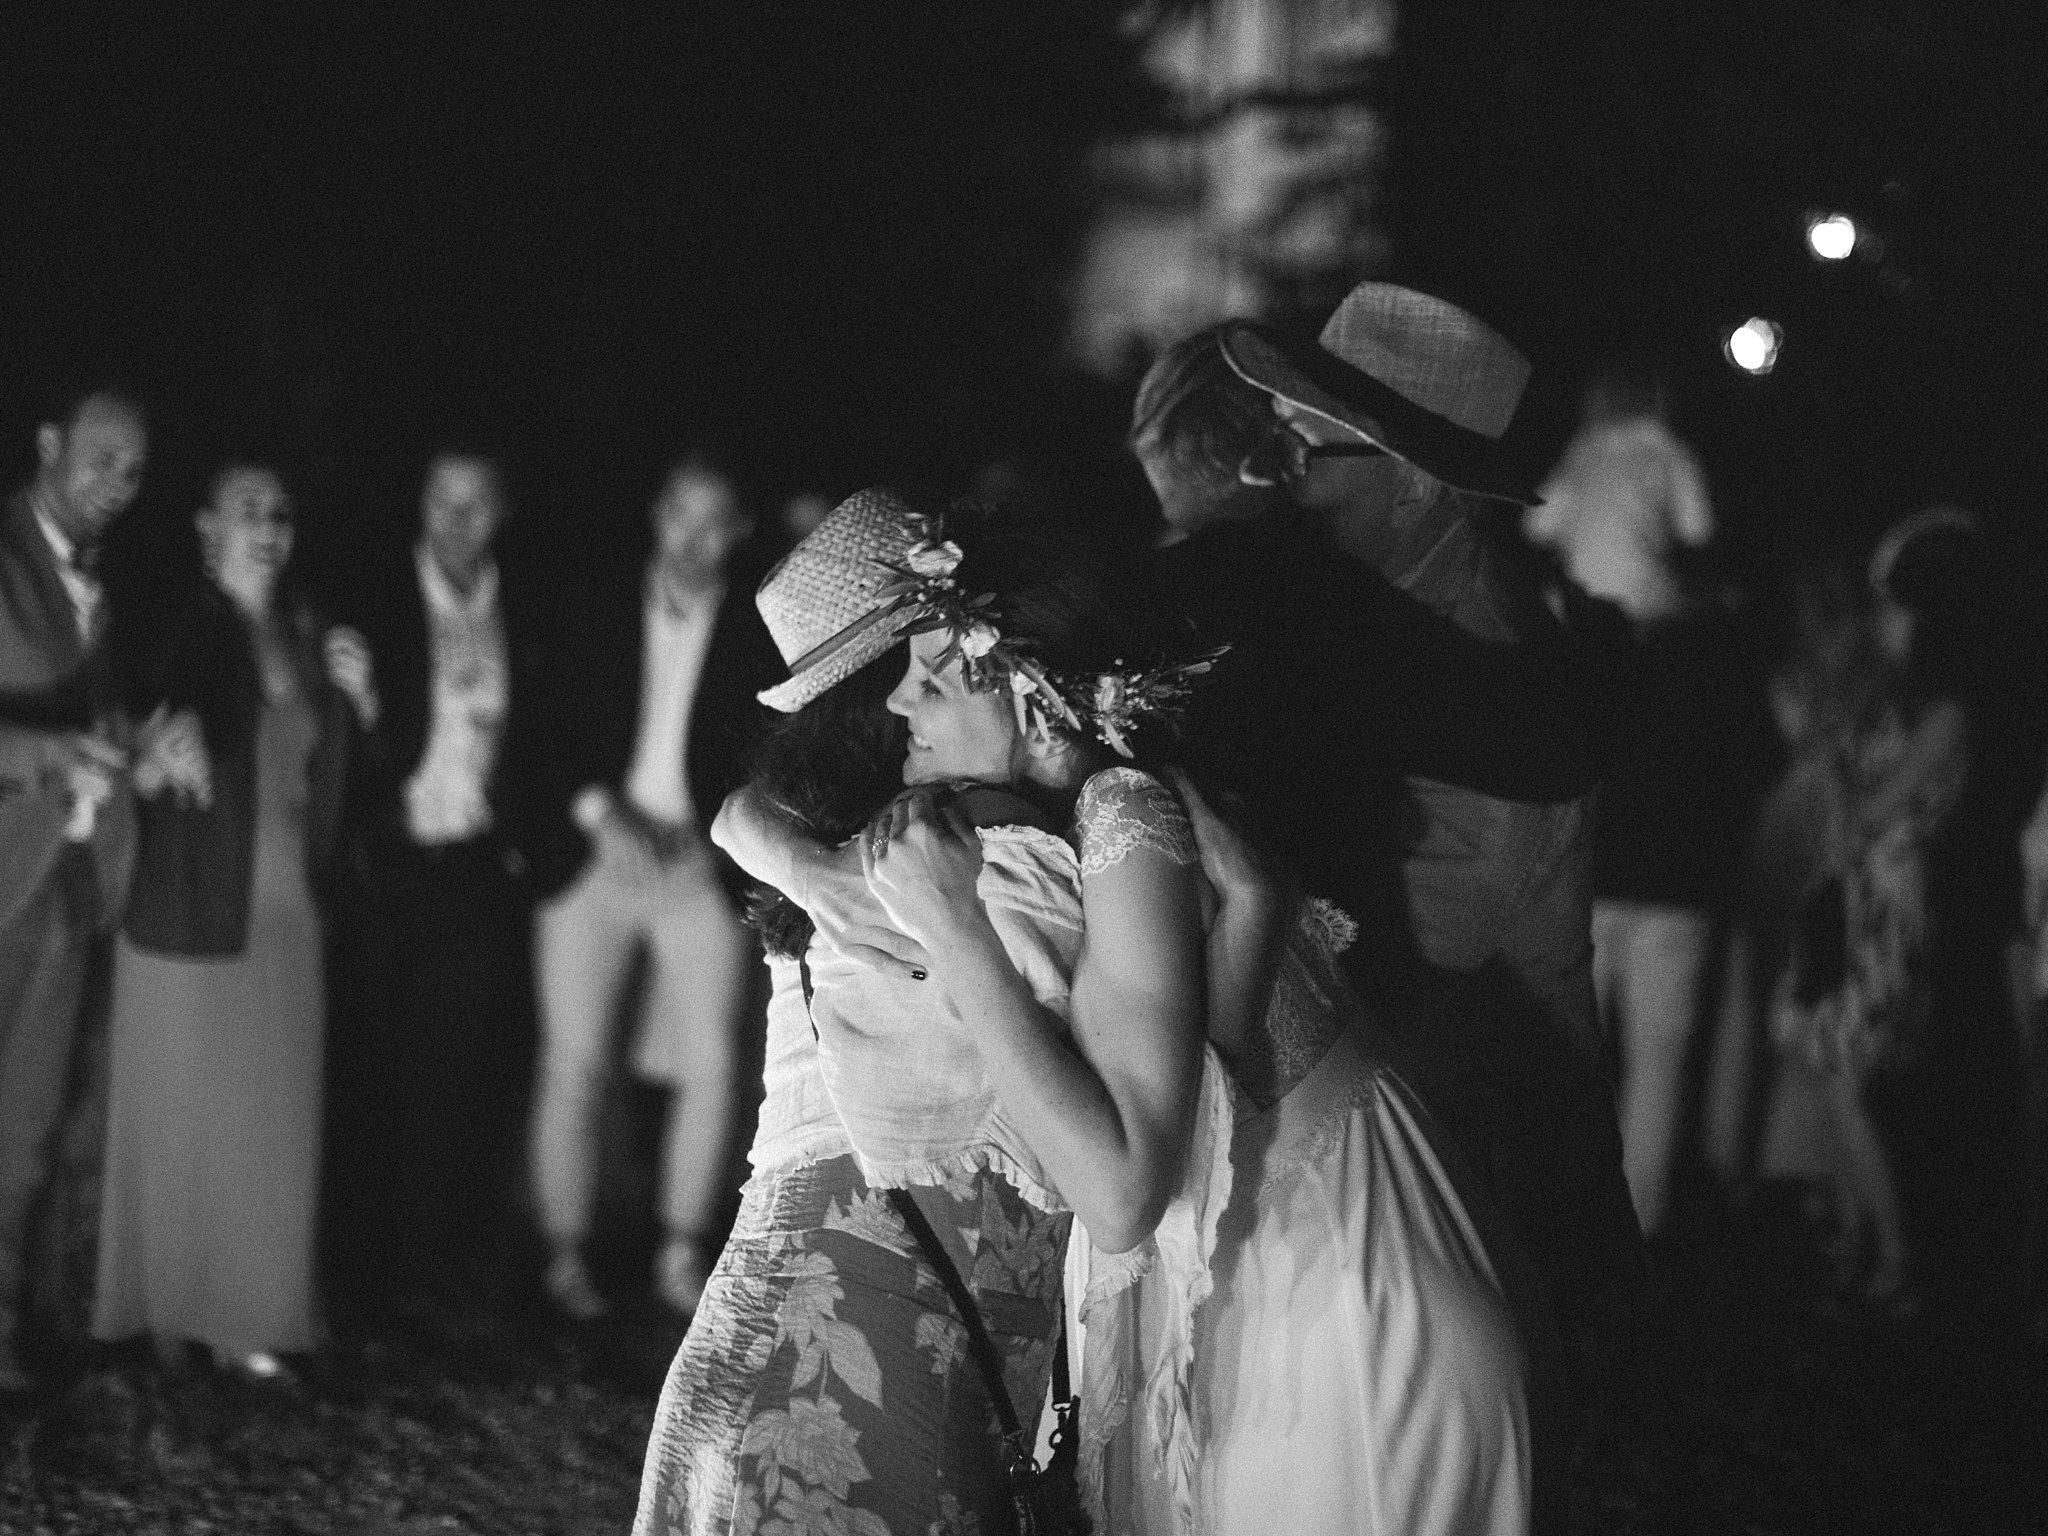 Wedding Photographer Perpignan - Château Las Collas Wedding - Hugo Hennequin121.jpg